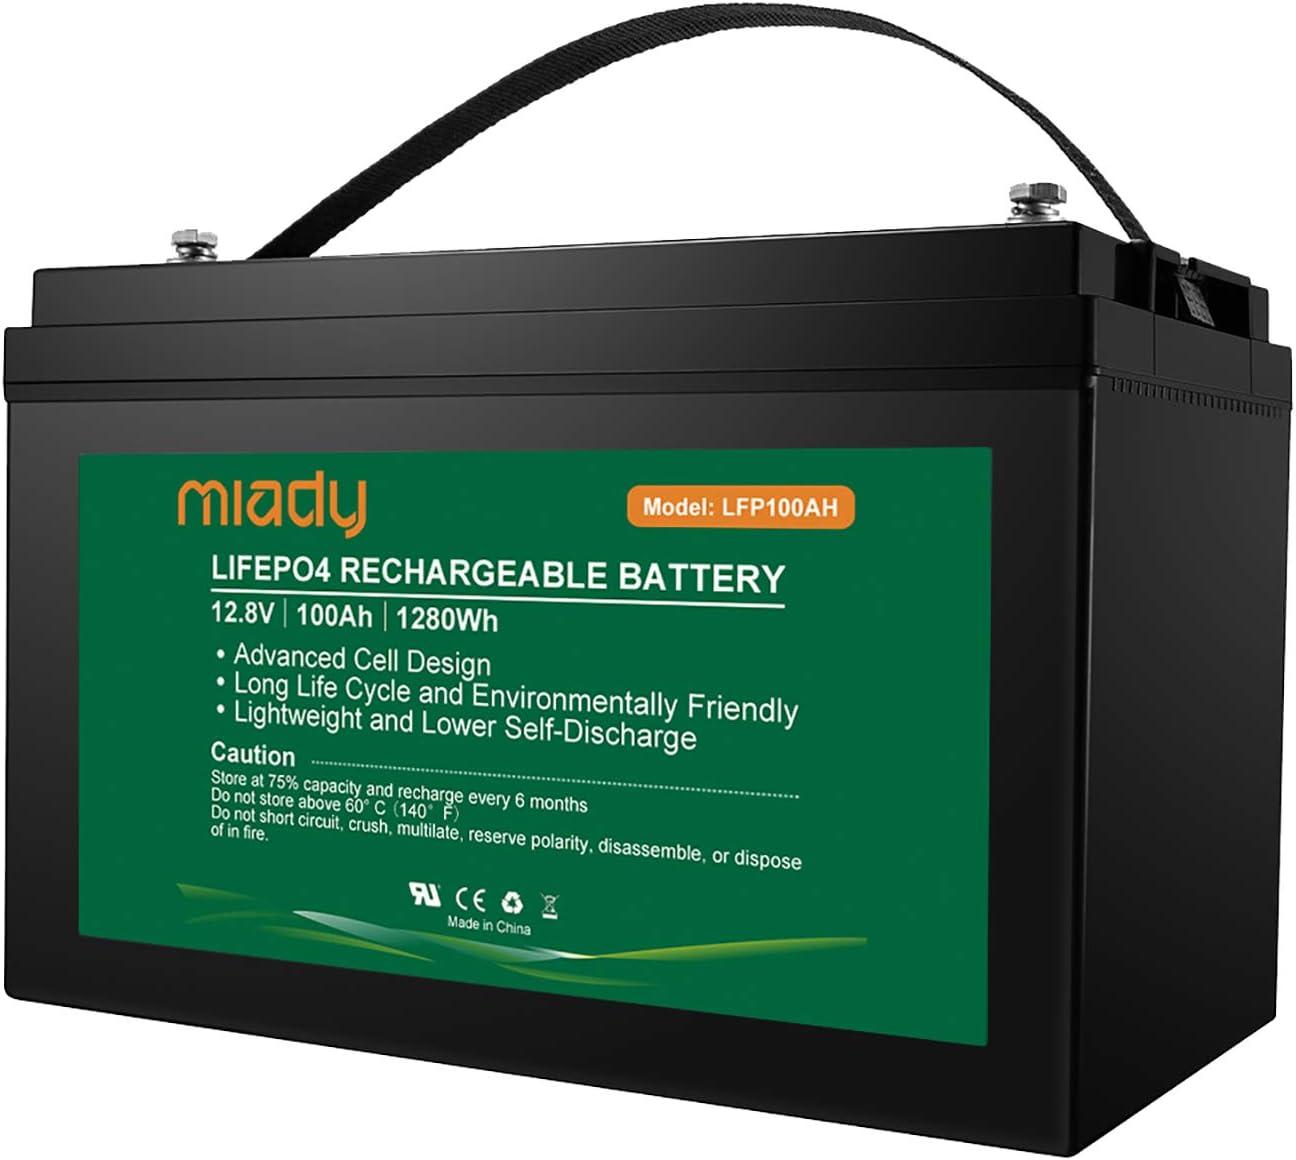 Miady 12V 100Ah Lithium Phosphate Battery